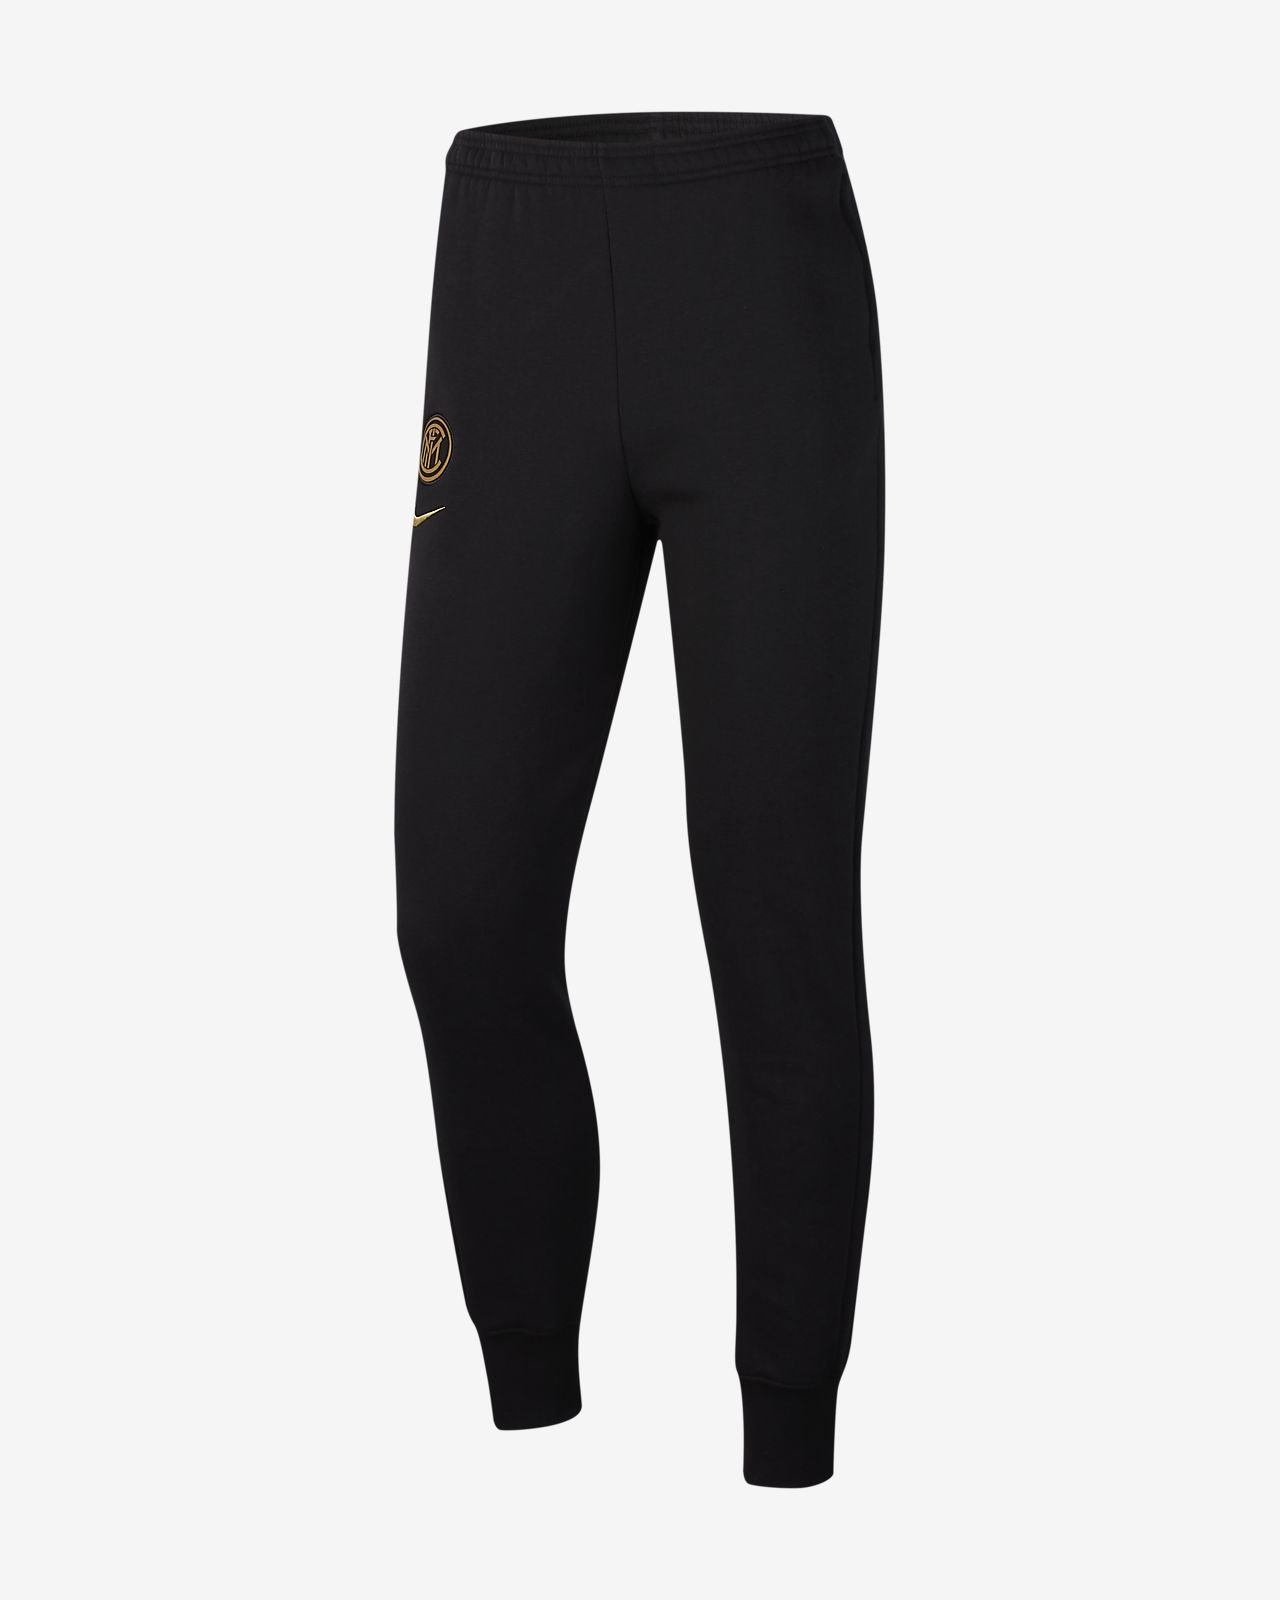 Inter Milan Pantalons de teixit Fleece - Home